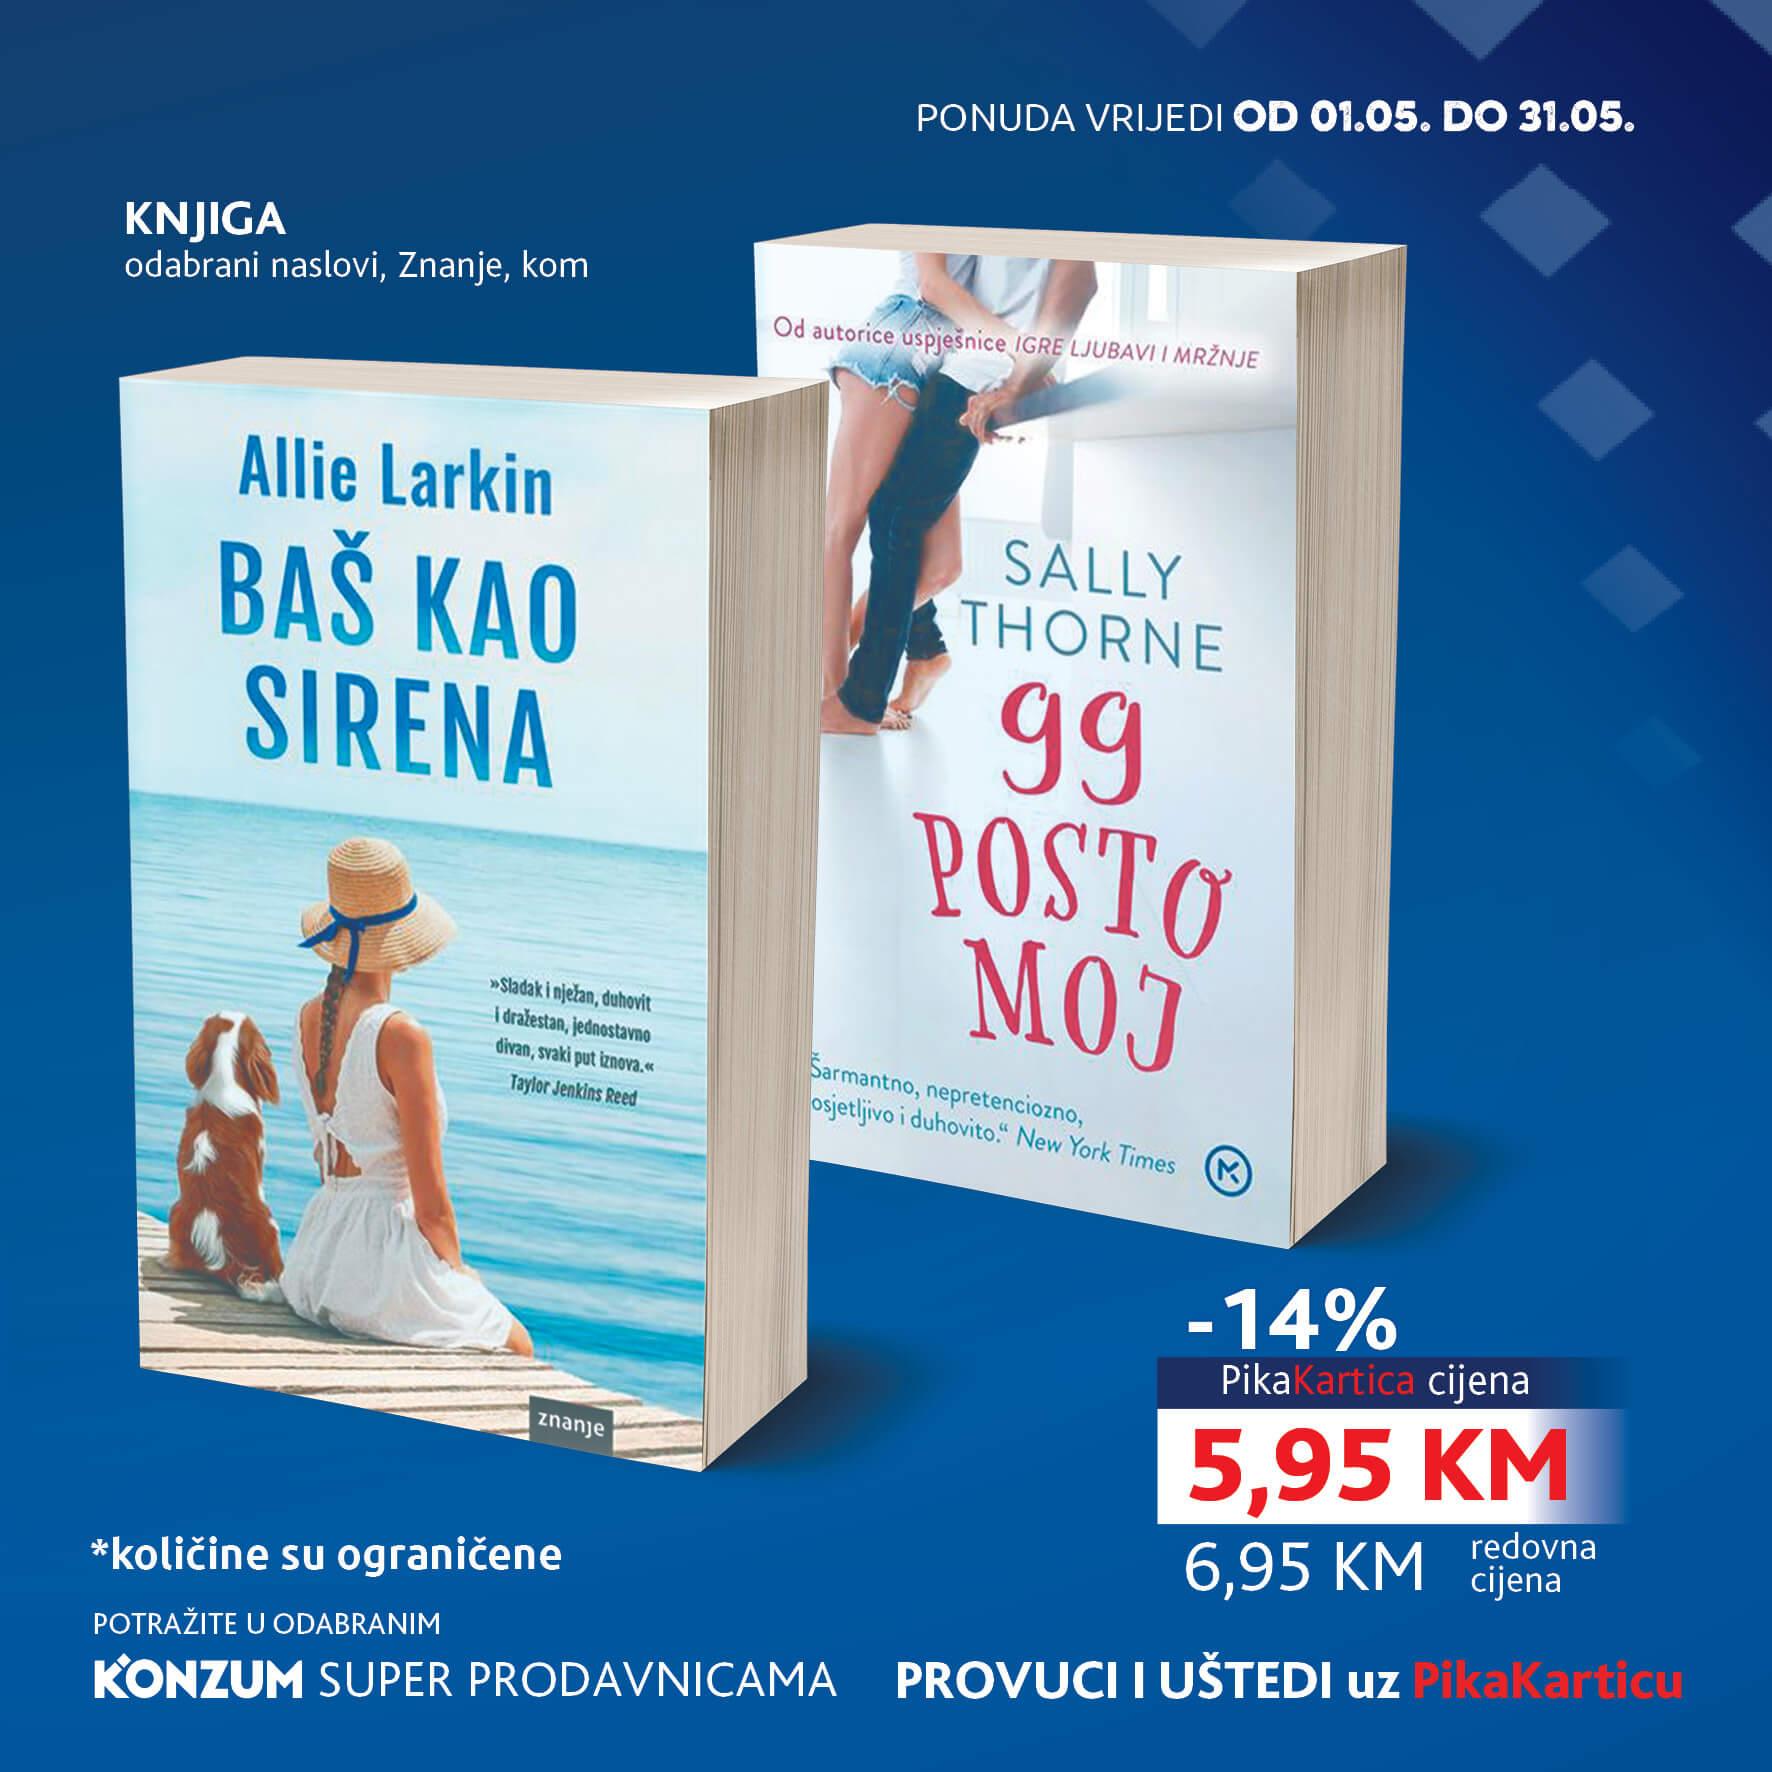 KONZUM Katalog PIKA Kartica AKCIJA MAJ 2021 01.05.2021. 31.05.2021. Page 25